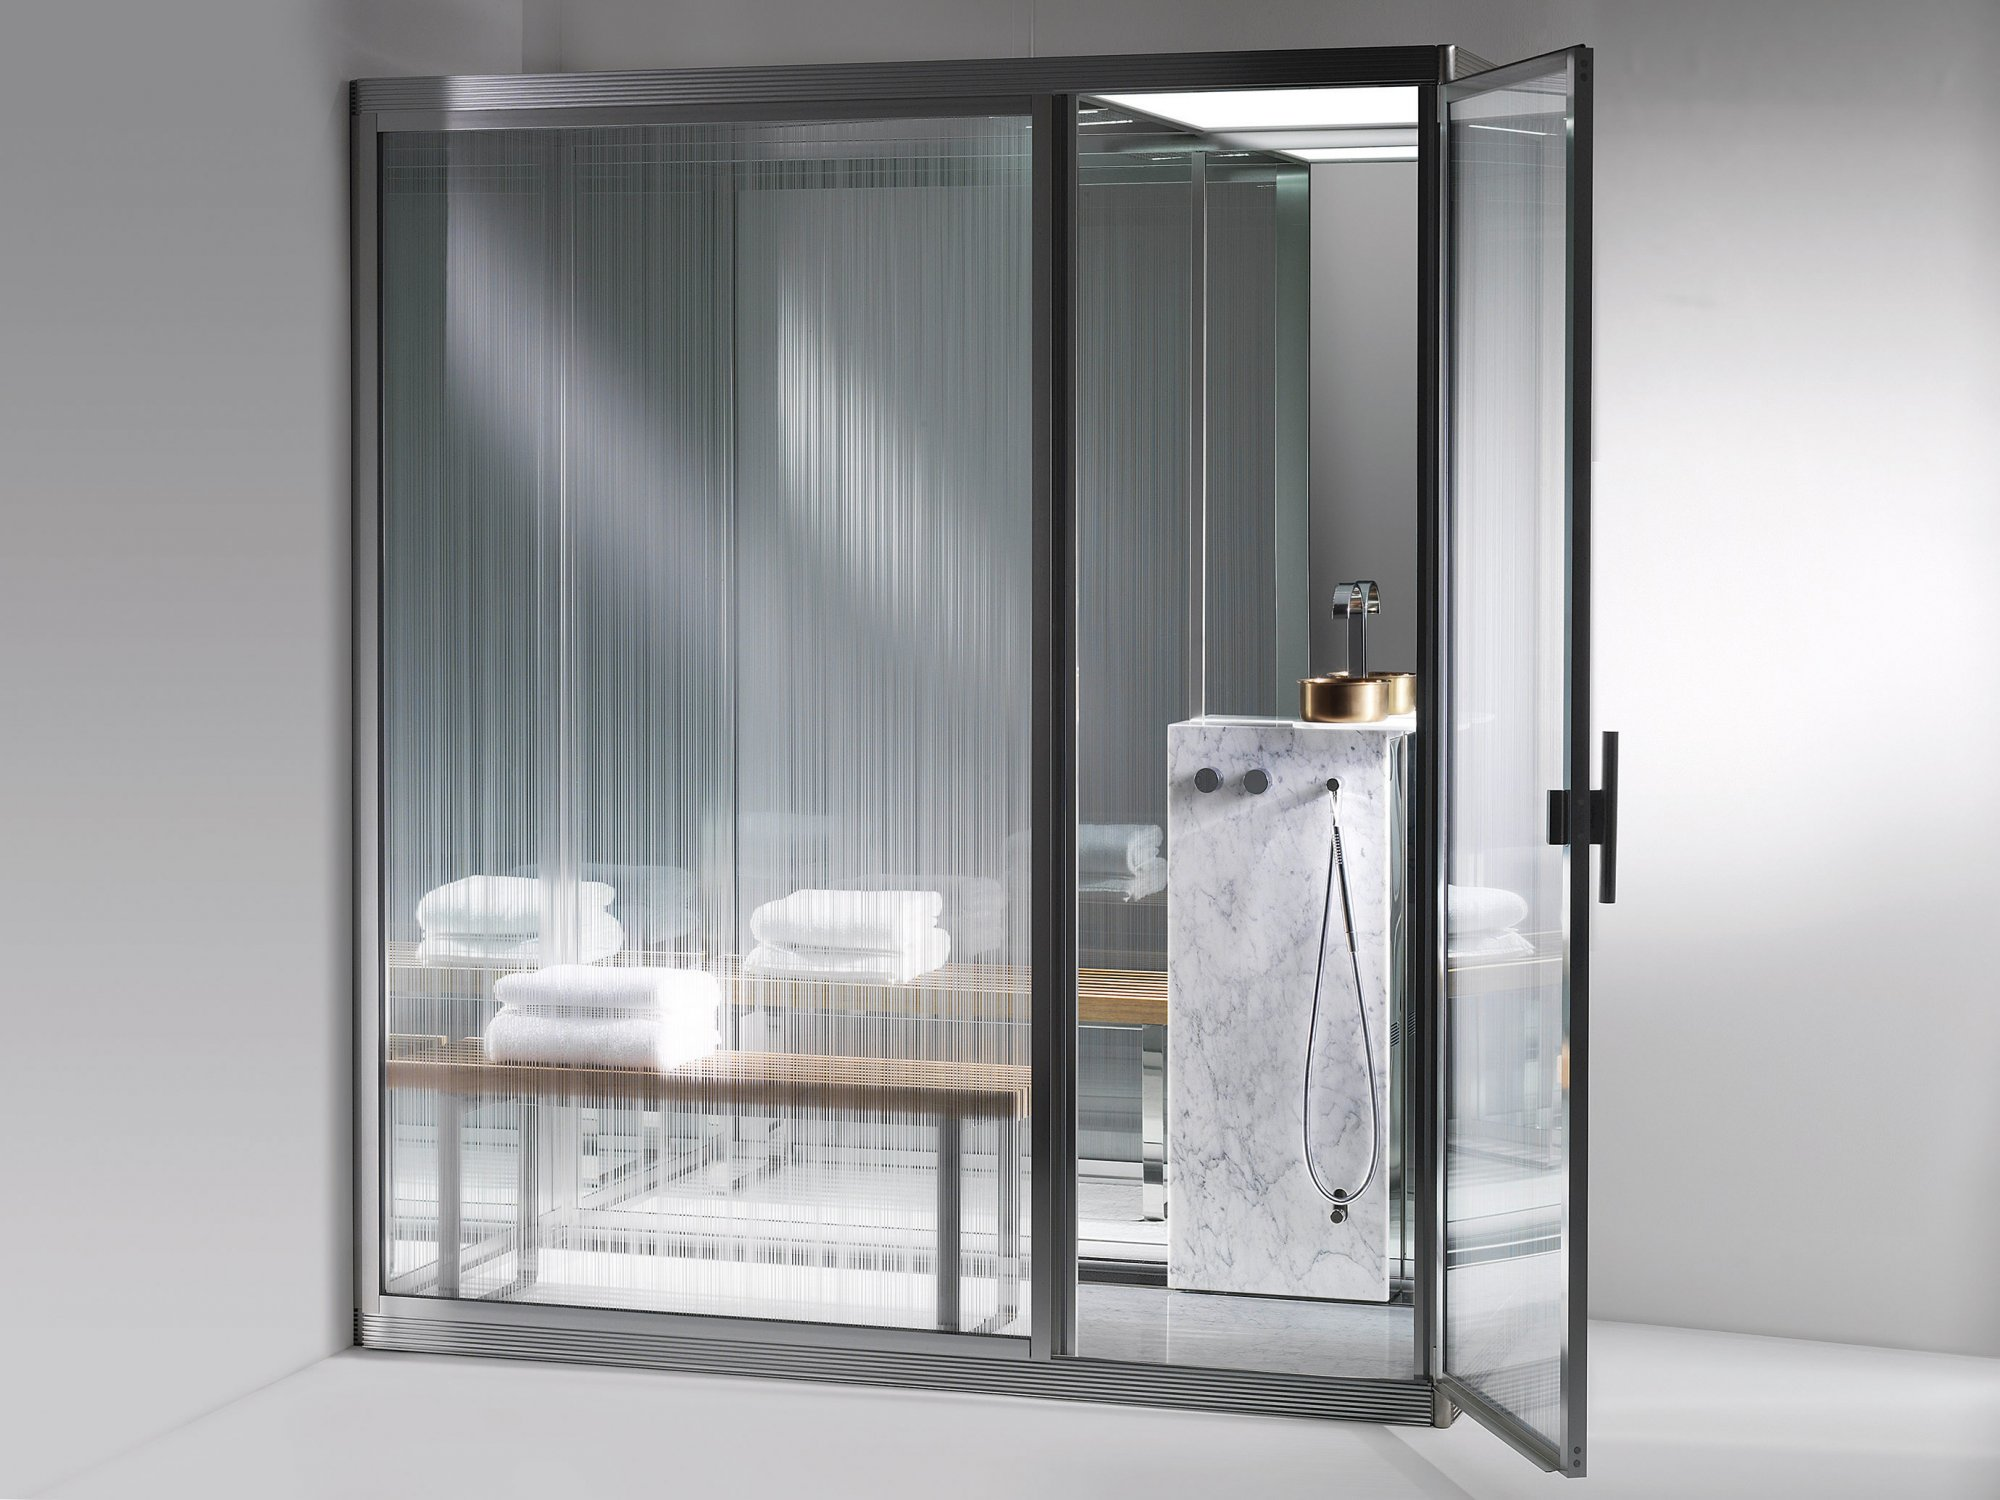 west one bathrooms topkapi sauna wellness lifestyle